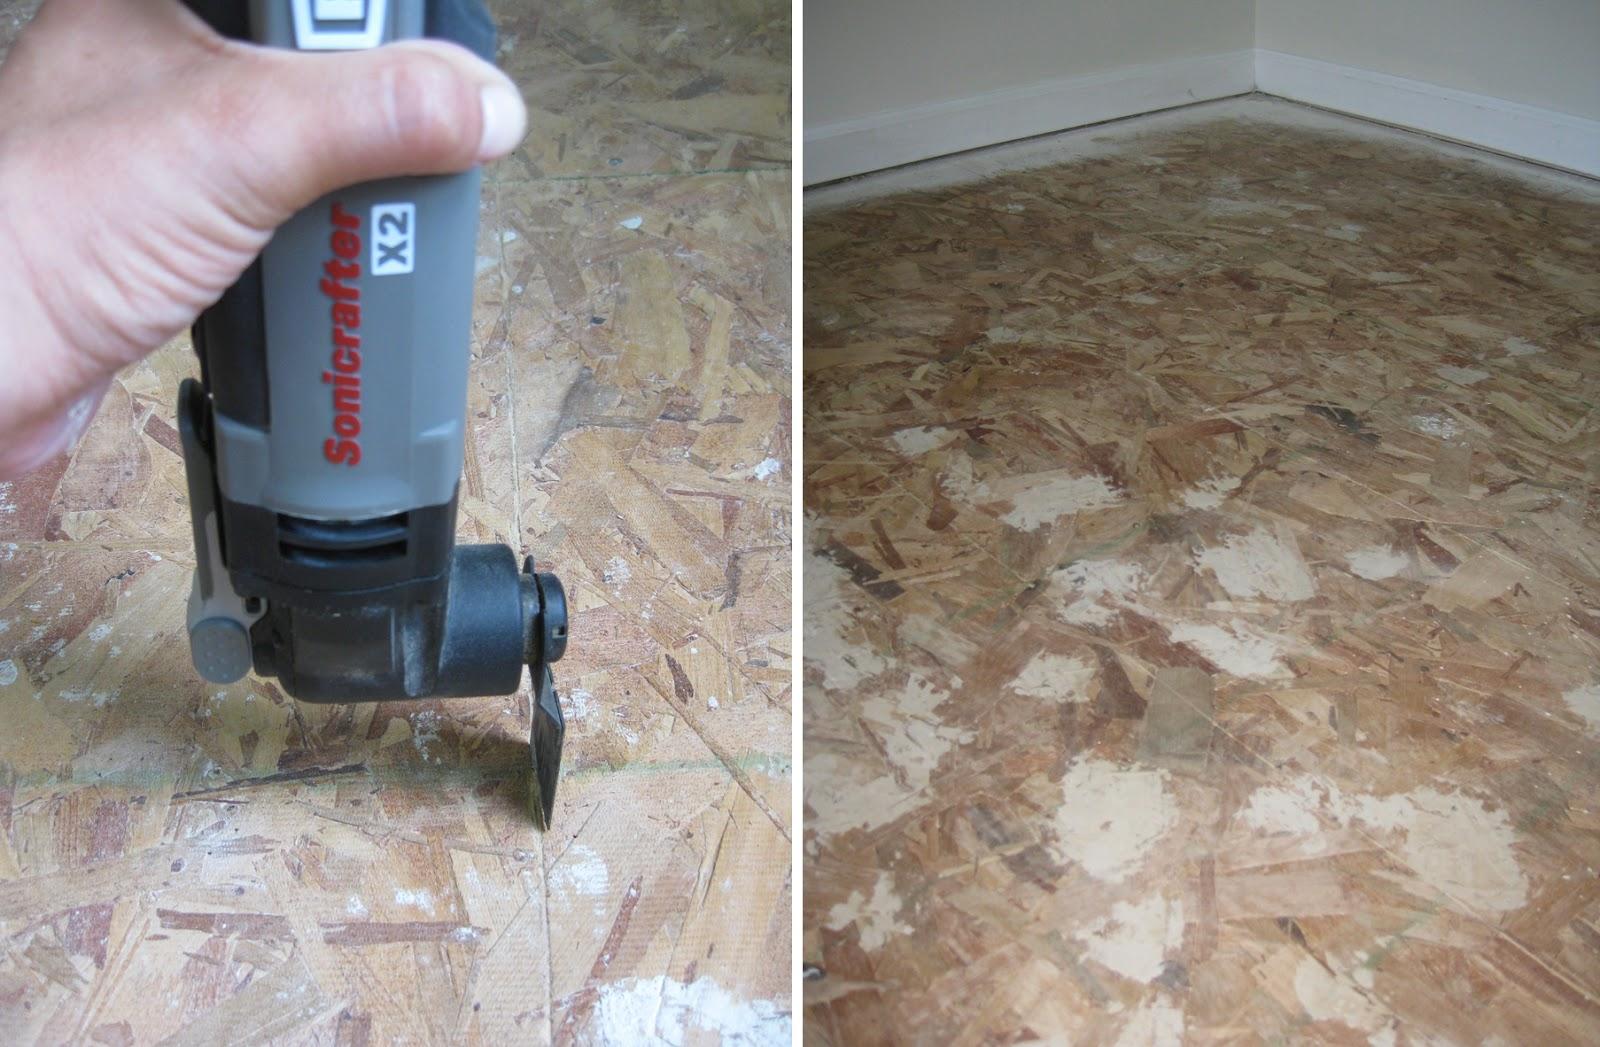 Diy painted designs on floor remodelando la casa for Wood floor hole filler